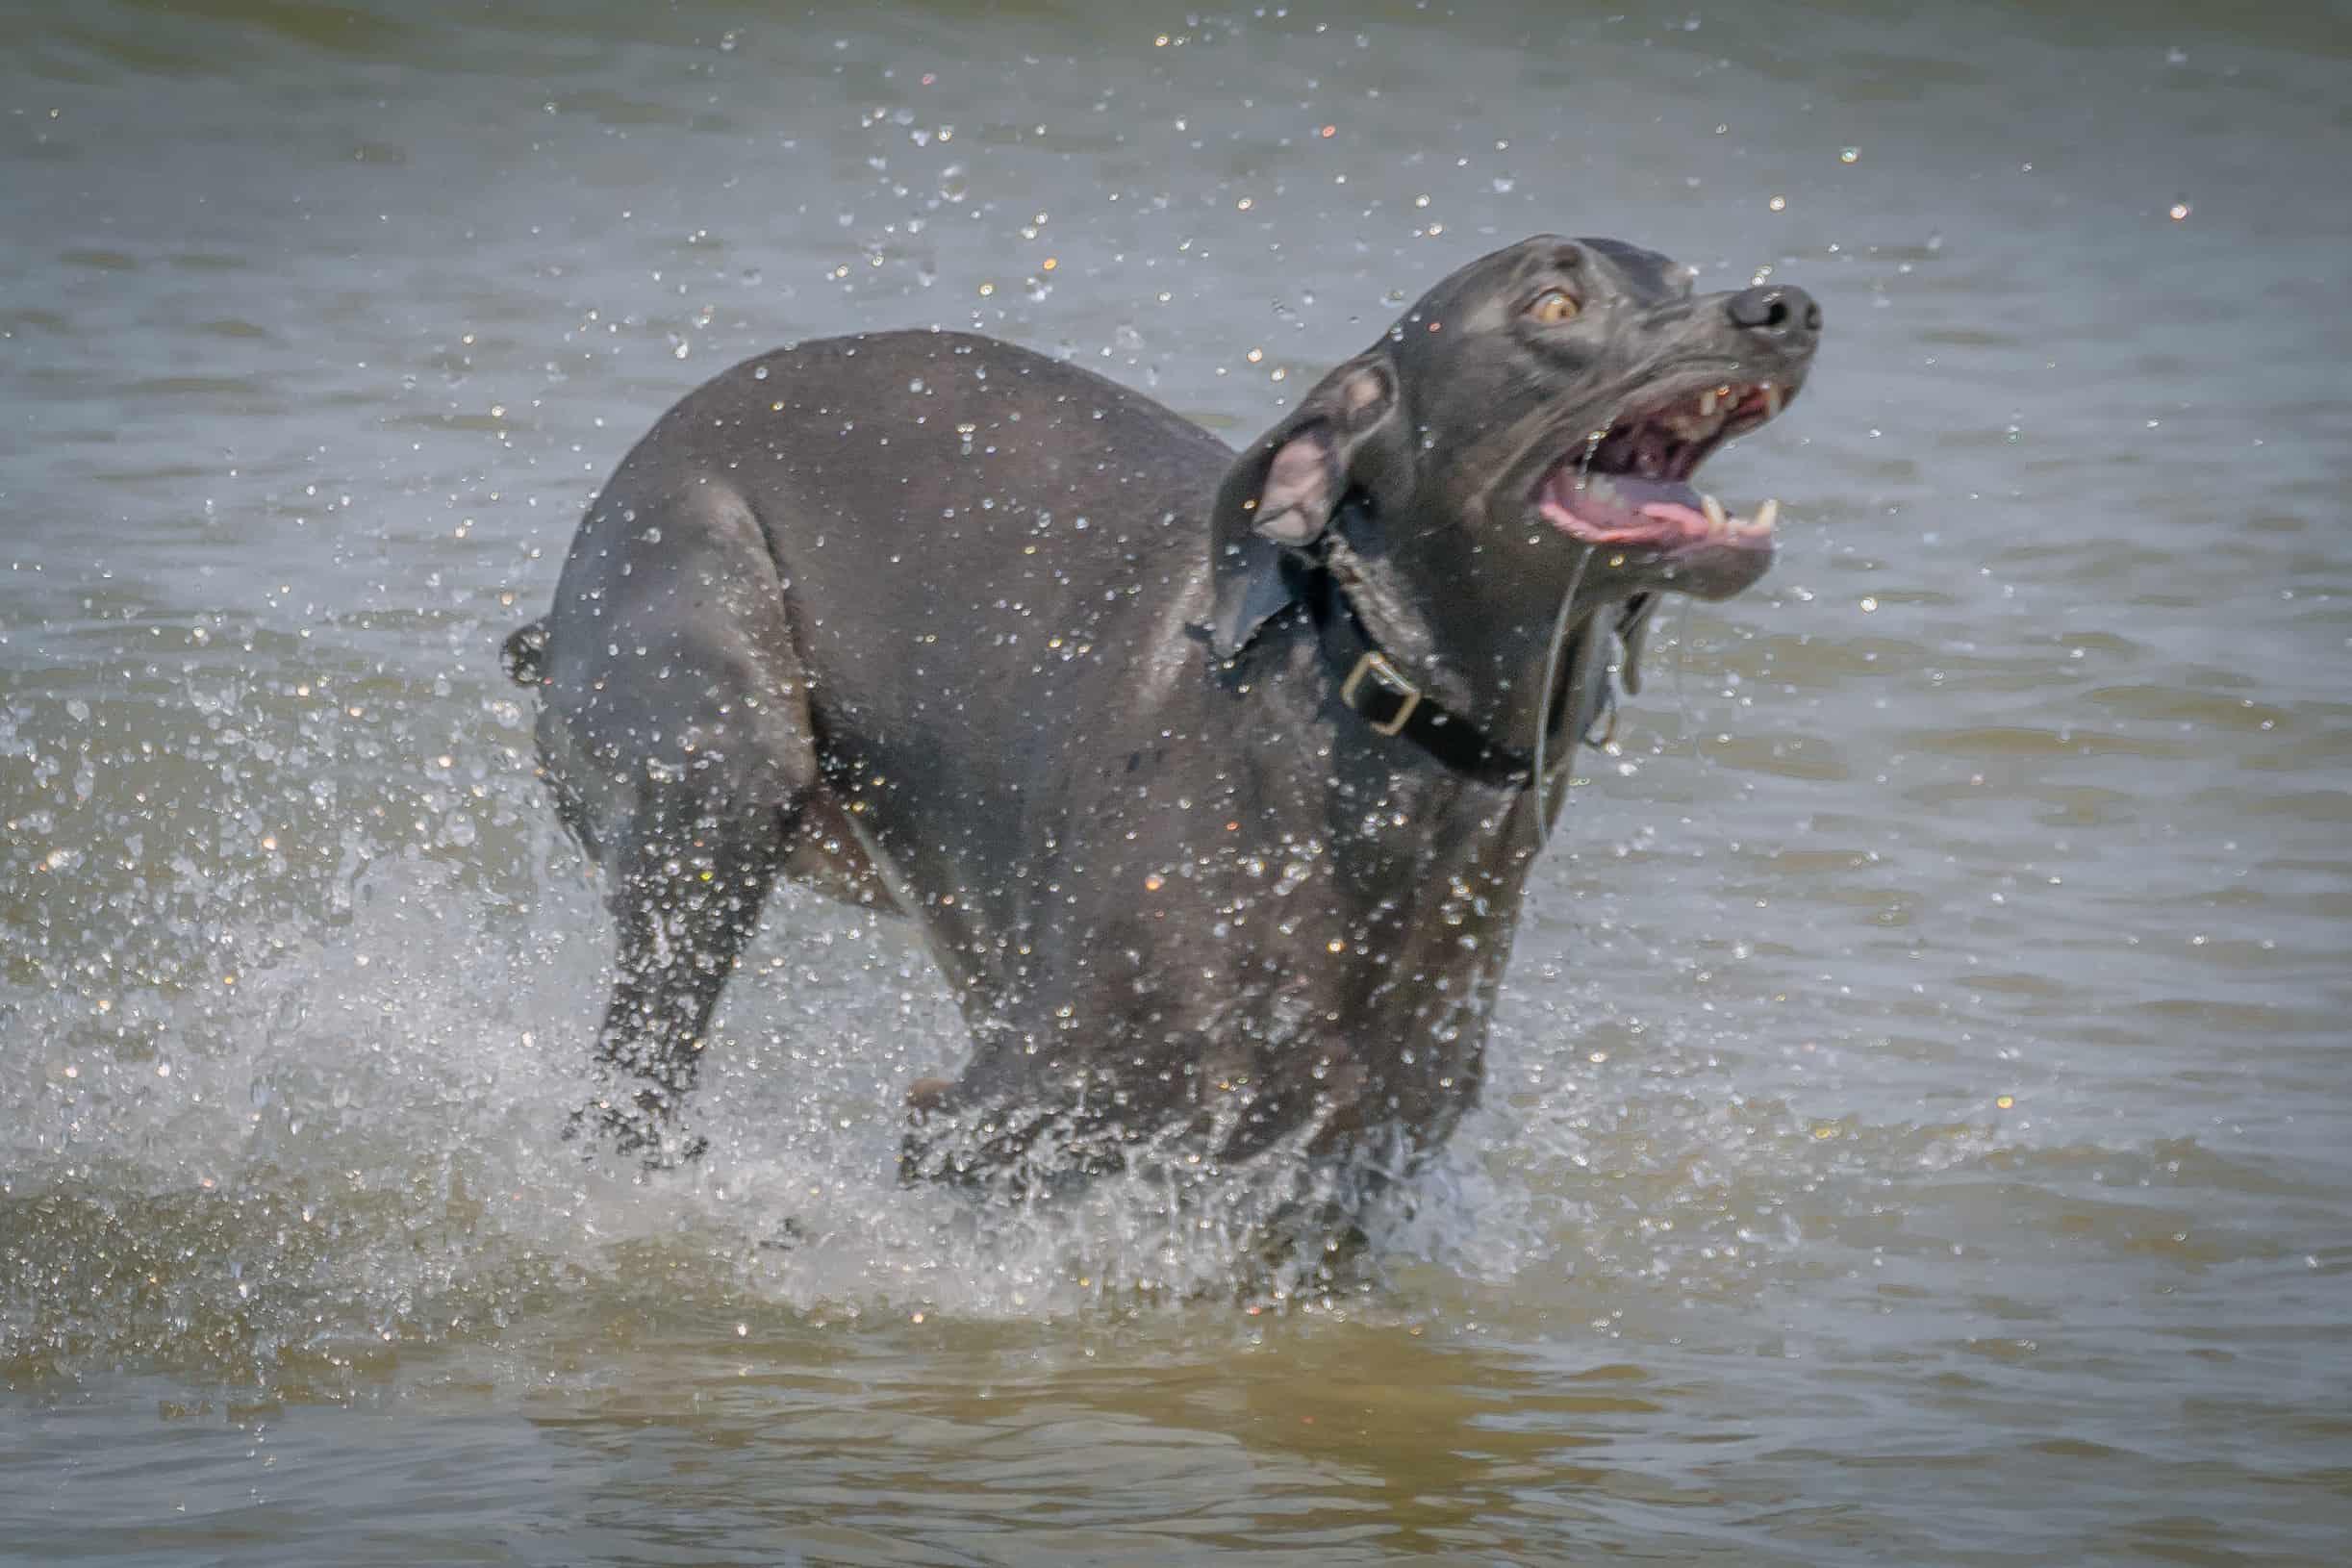 Rhodesian Ridgeback, puppy, chicago, dogs, montrose dog beach, adventure